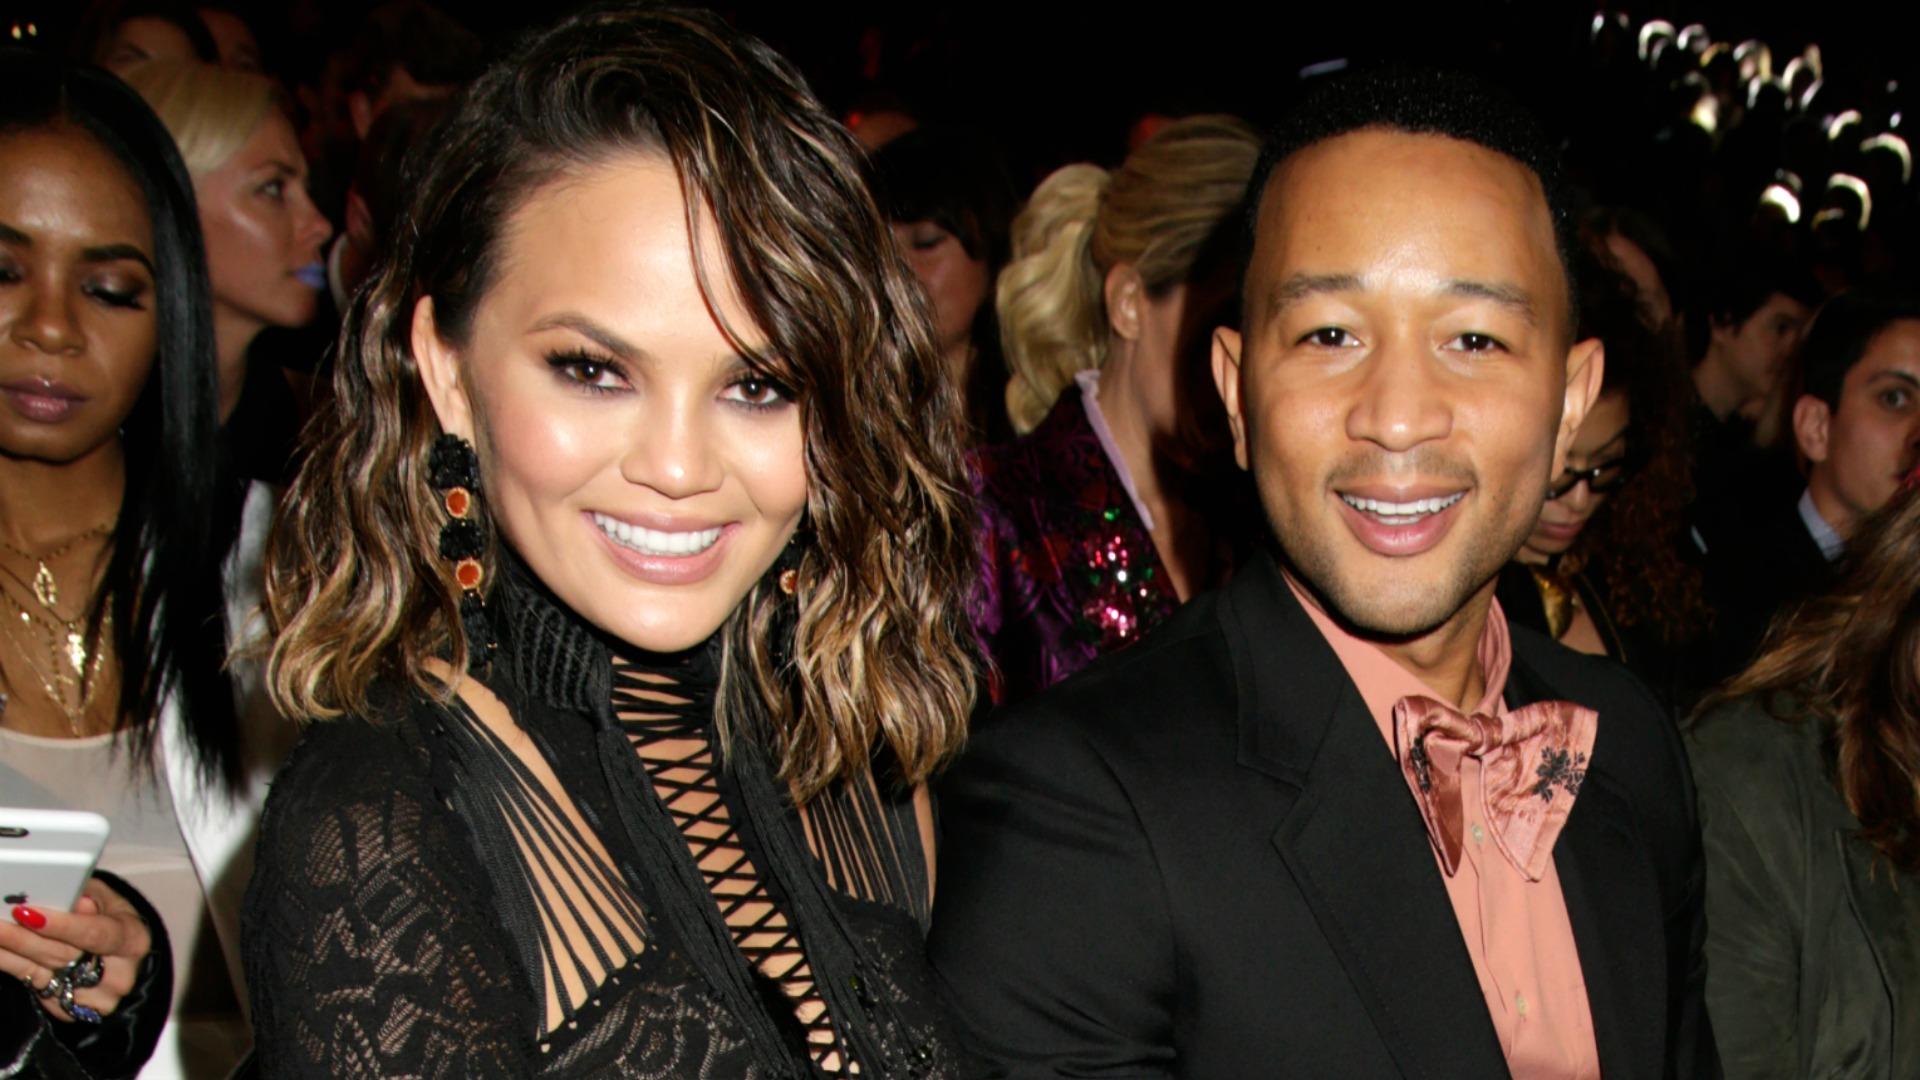 Chrissy Teigen and John Legend sure make one handsome couple.